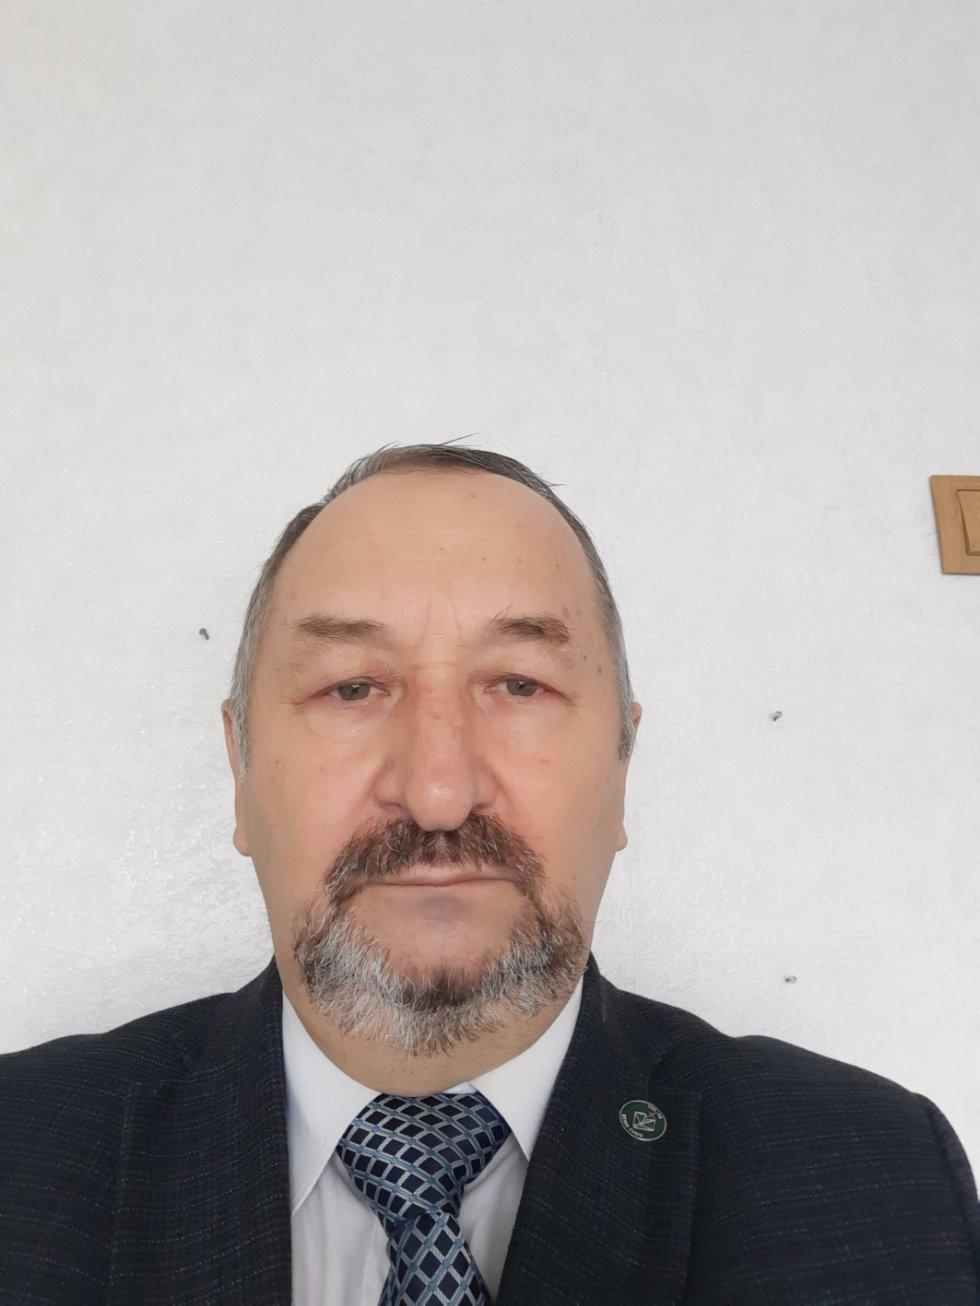 Шигапов Зинатулла Гамирович